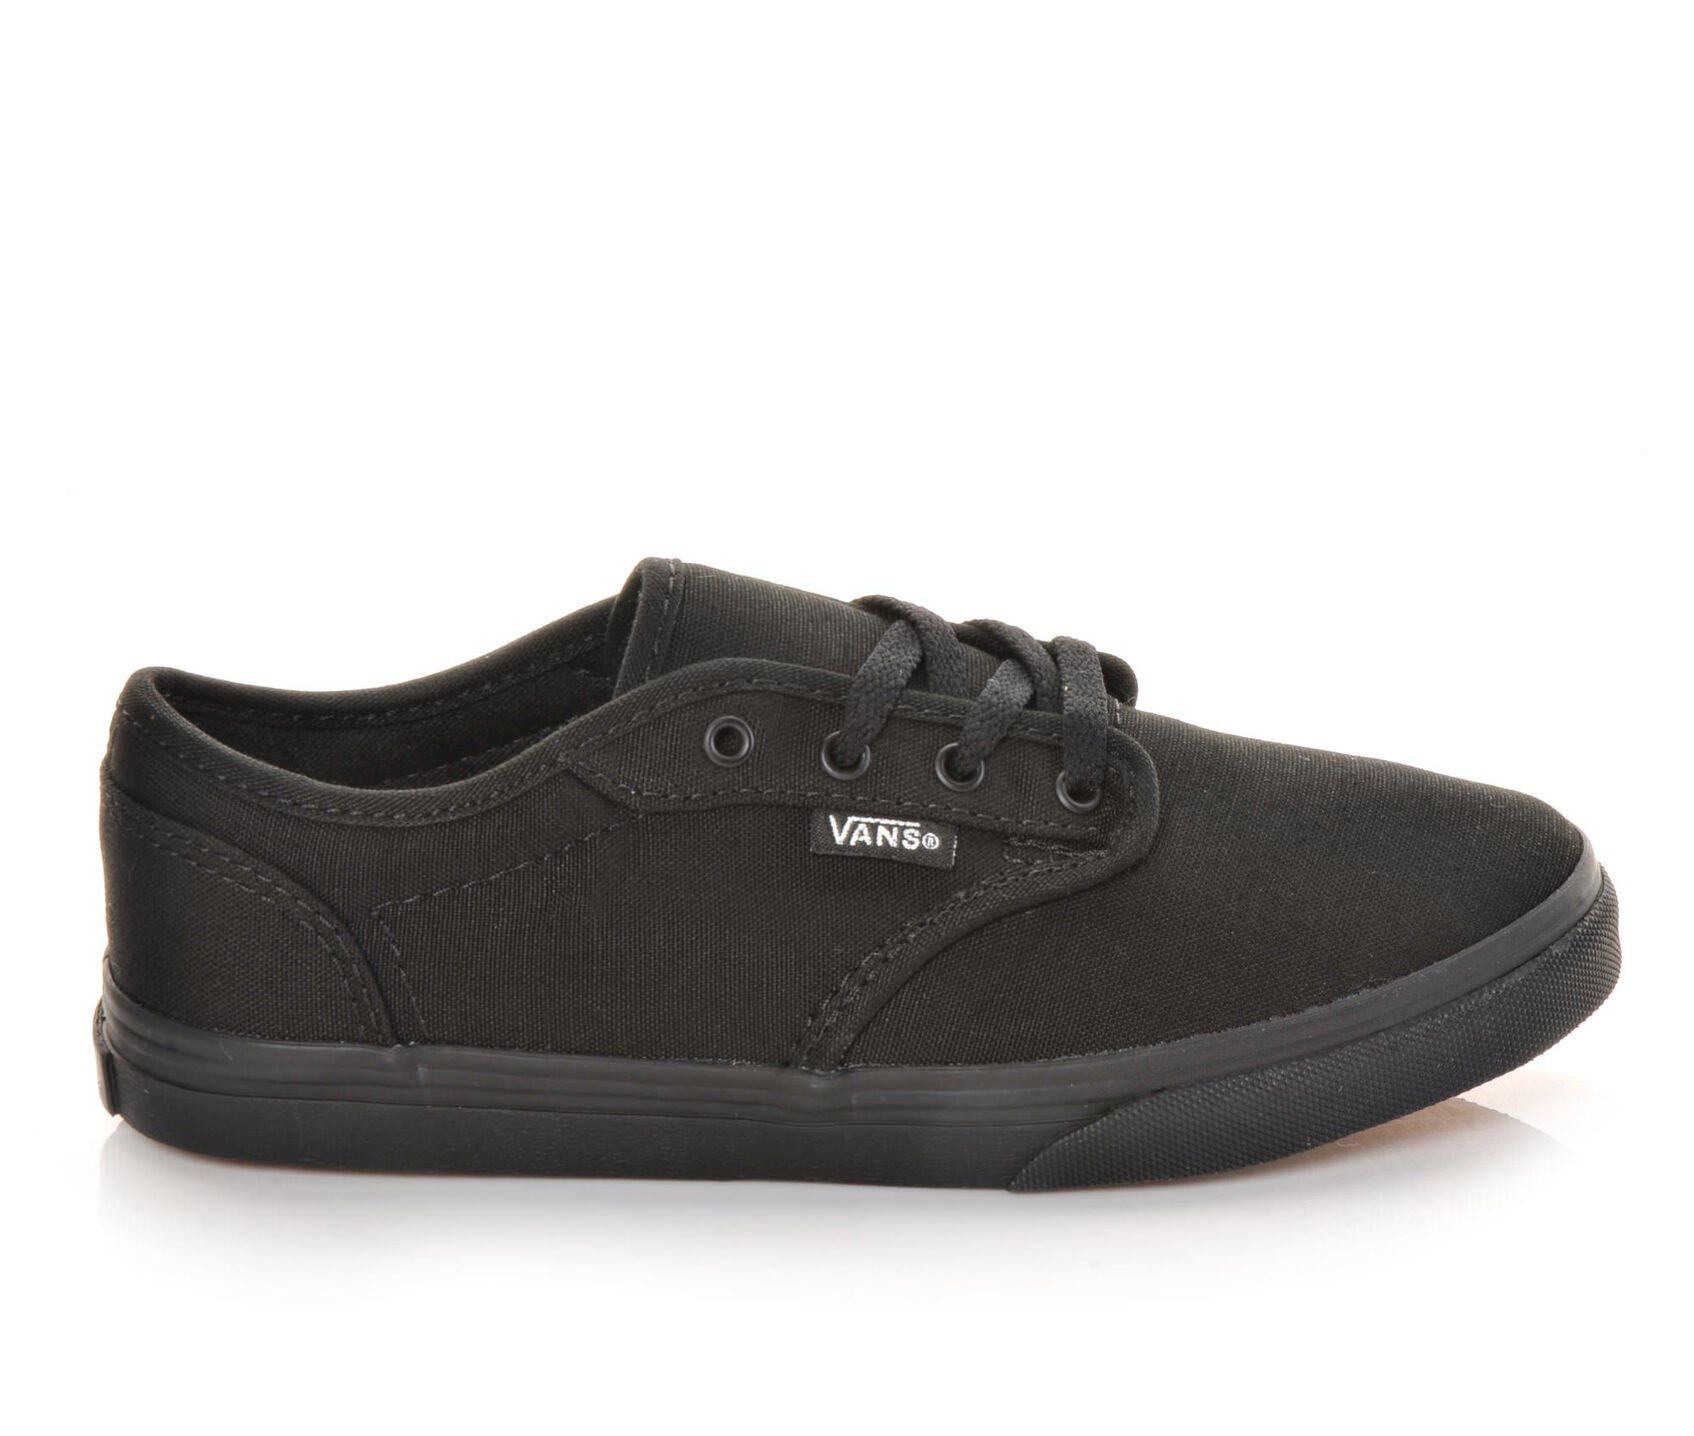 efb073e5d3 Girls  Vans Little Kid   Big Kid Atwood Low Skate Shoes